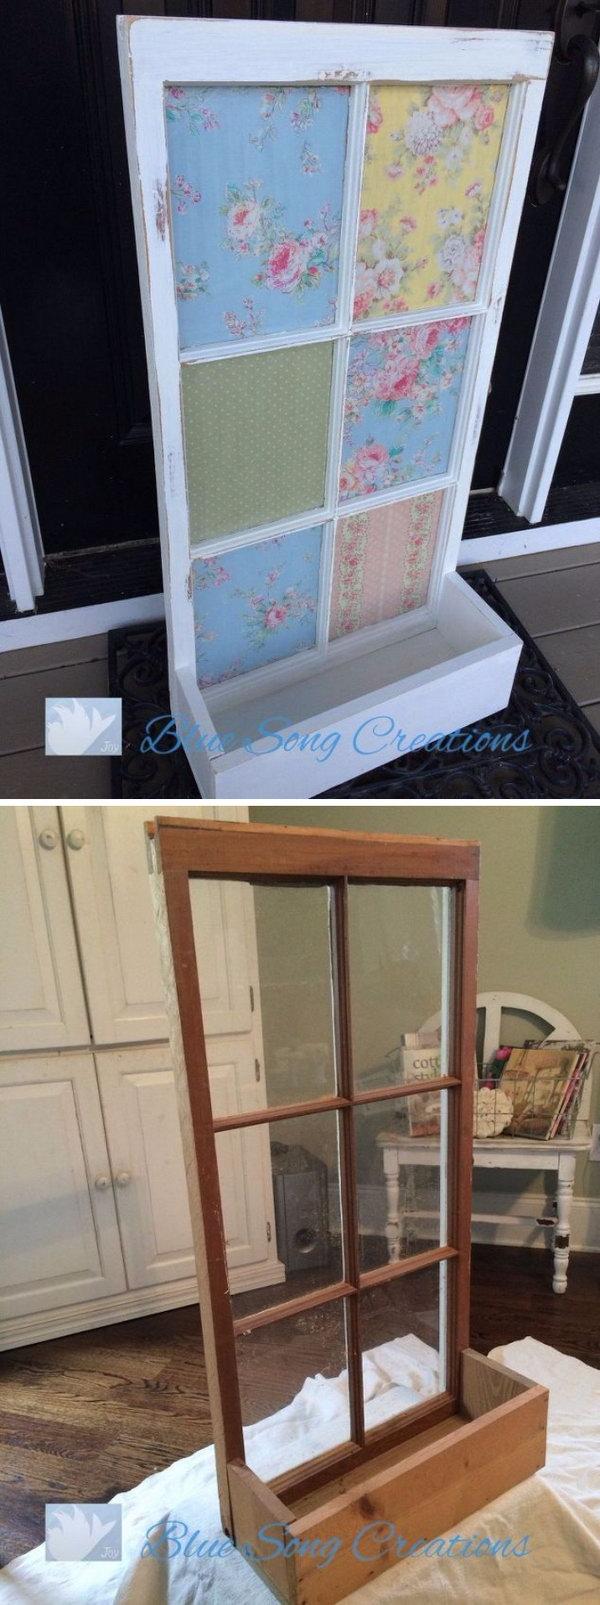 DIY Shabby Chic Window Box